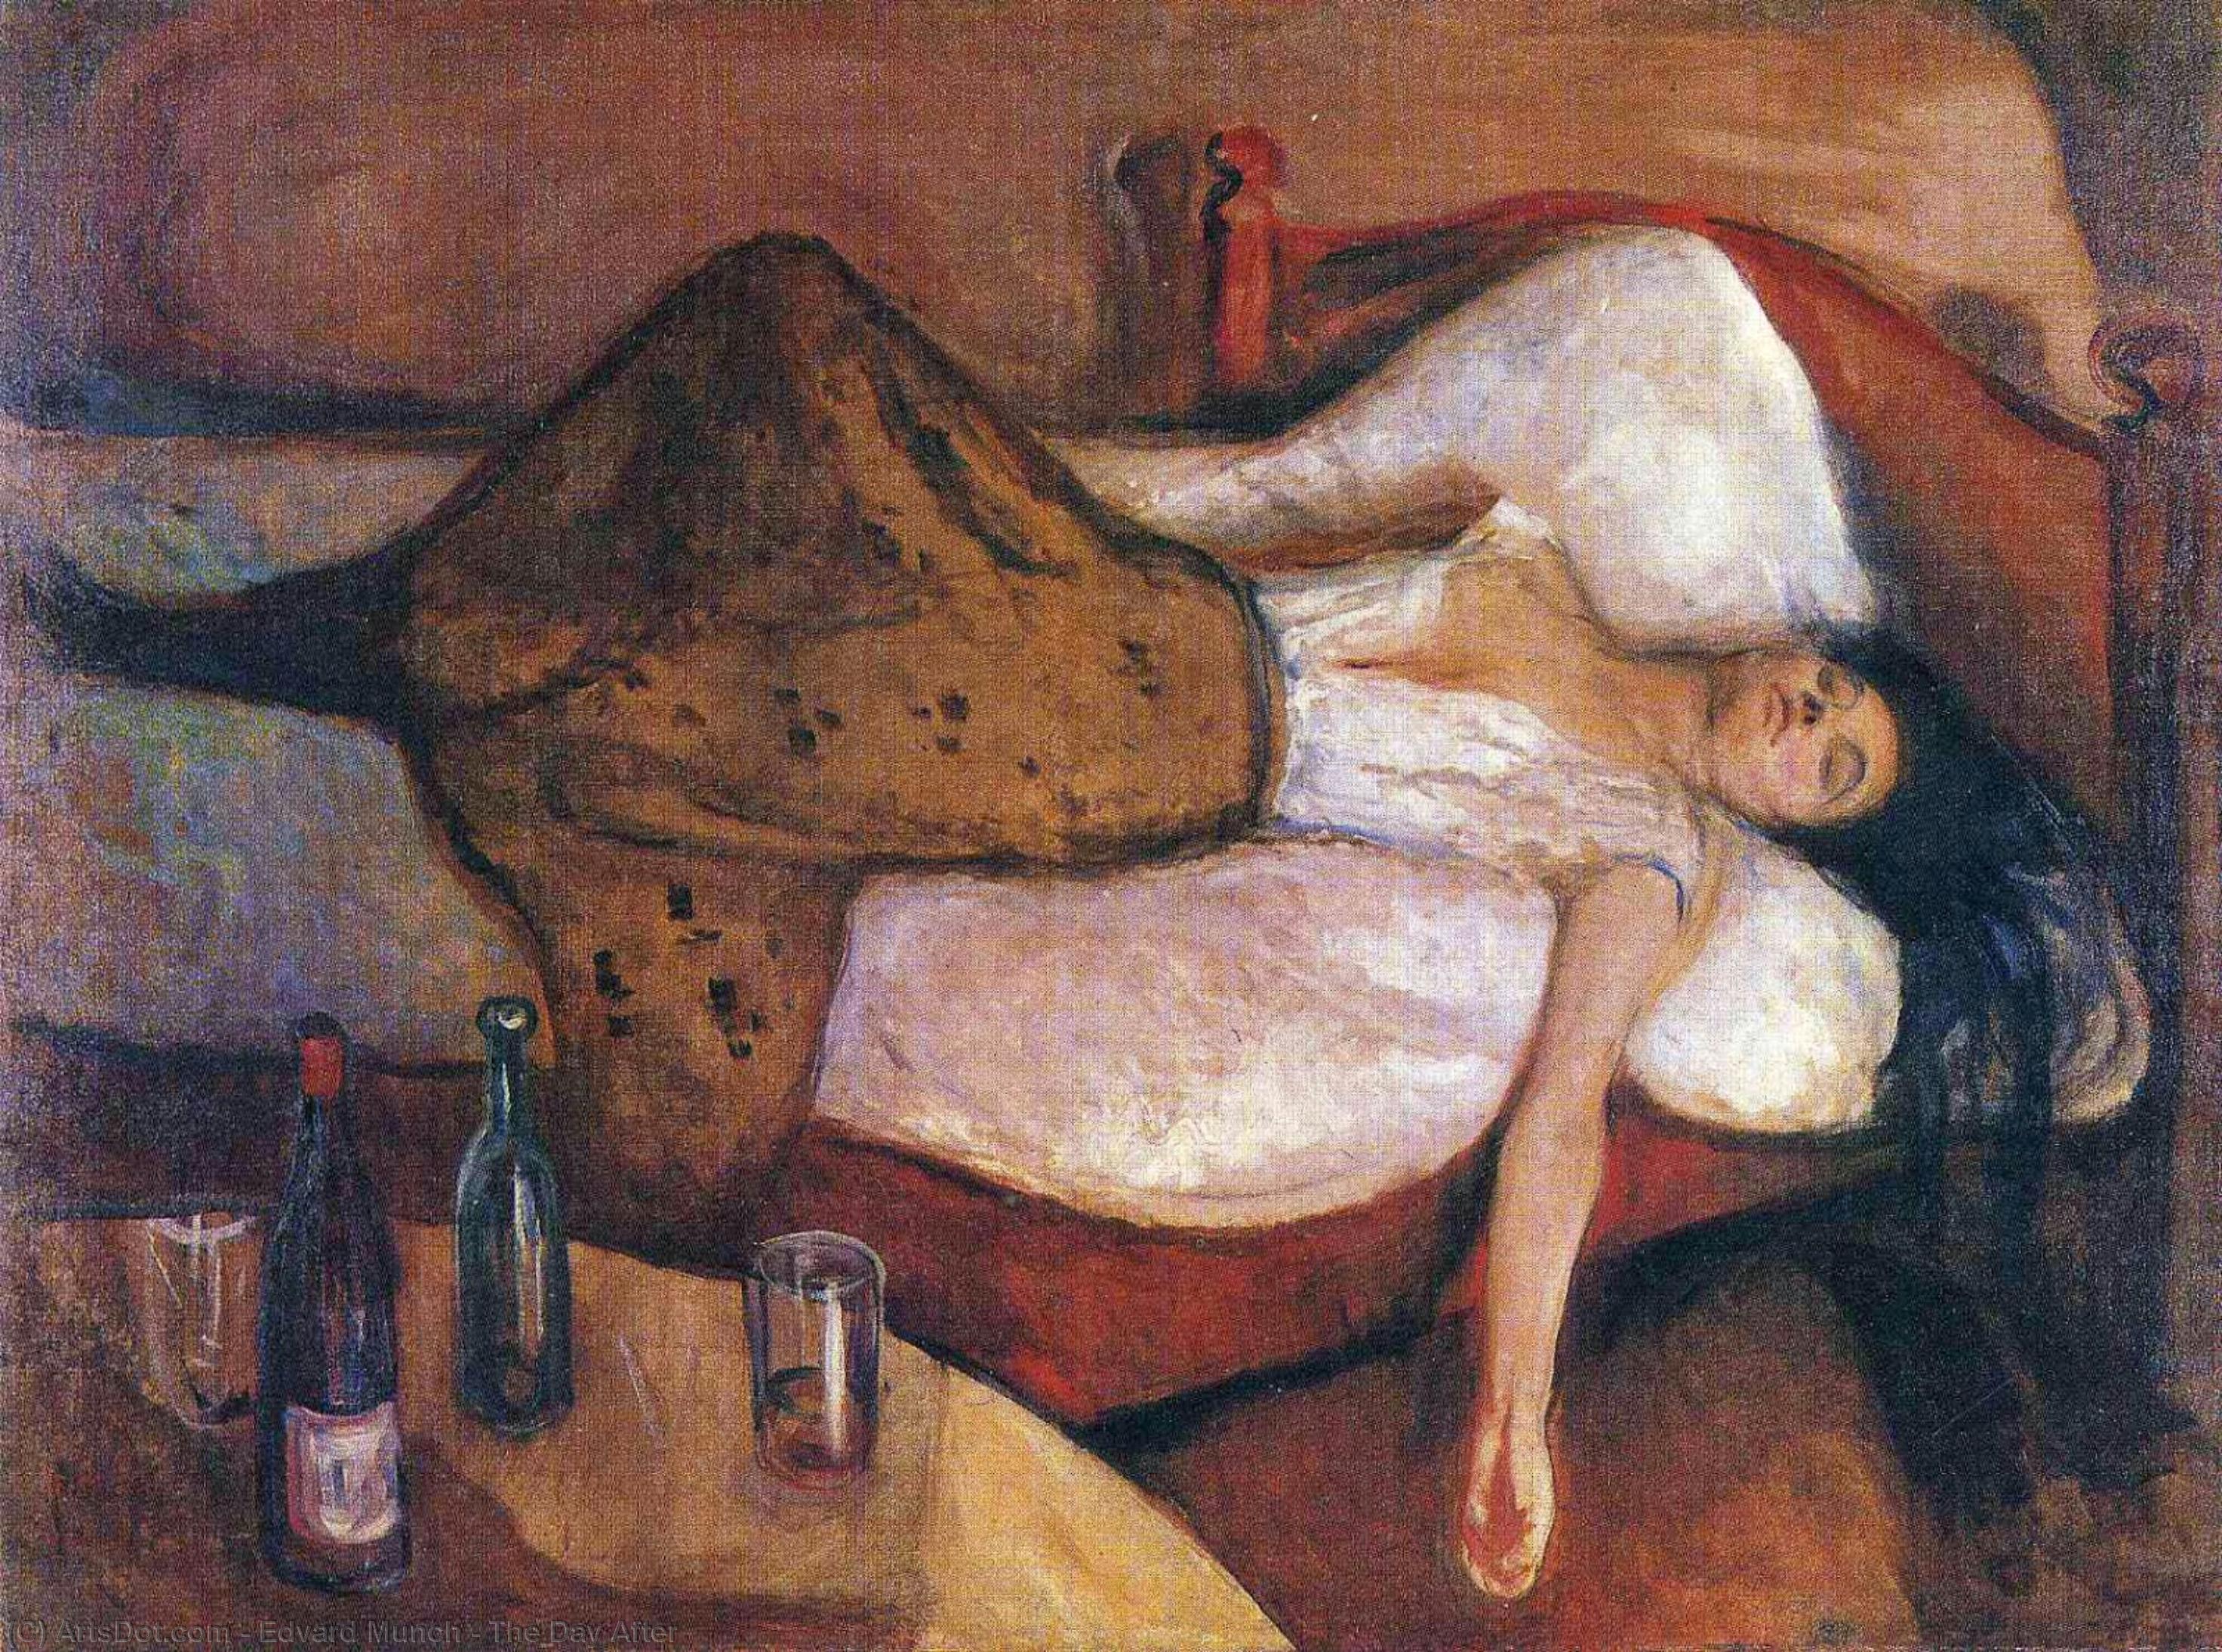 WikiOO.org - Encyclopedia of Fine Arts - Schilderen, Artwork Edvard Munch - The Day After